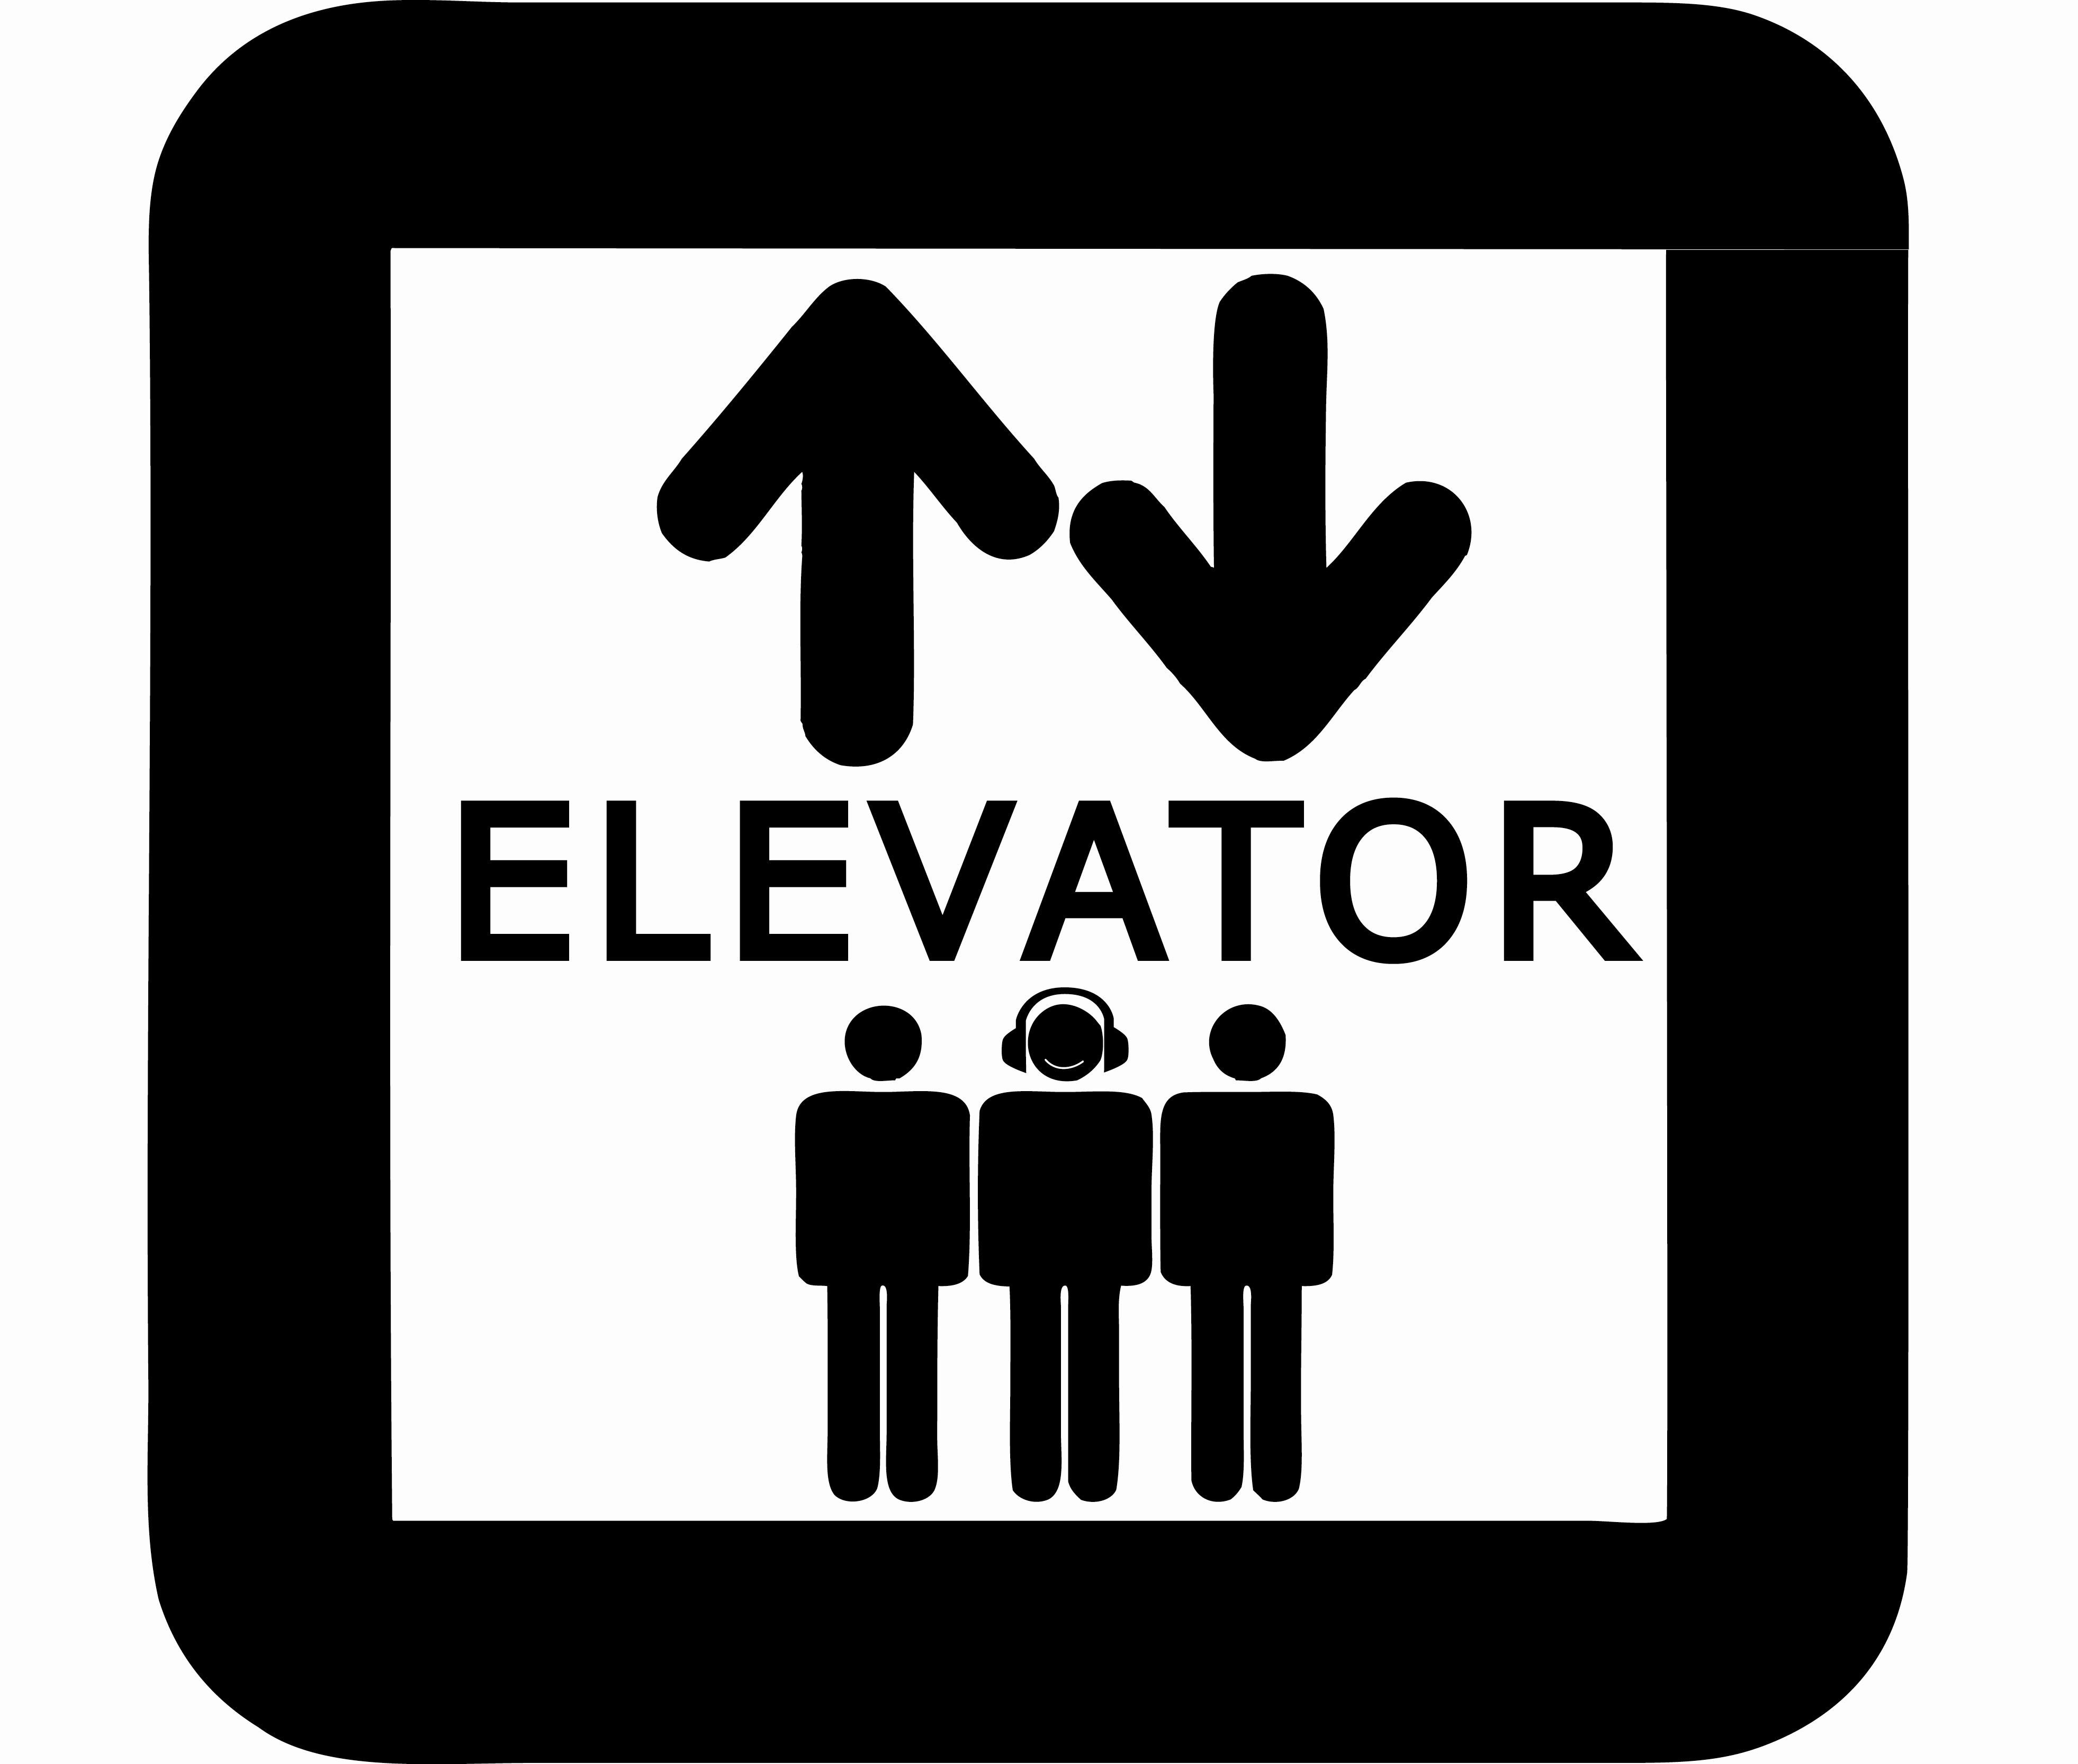 elevator engineer visa available or transferable iqama gulf jobs elevator engineer visa available or transferable iqama 337 views2 applications